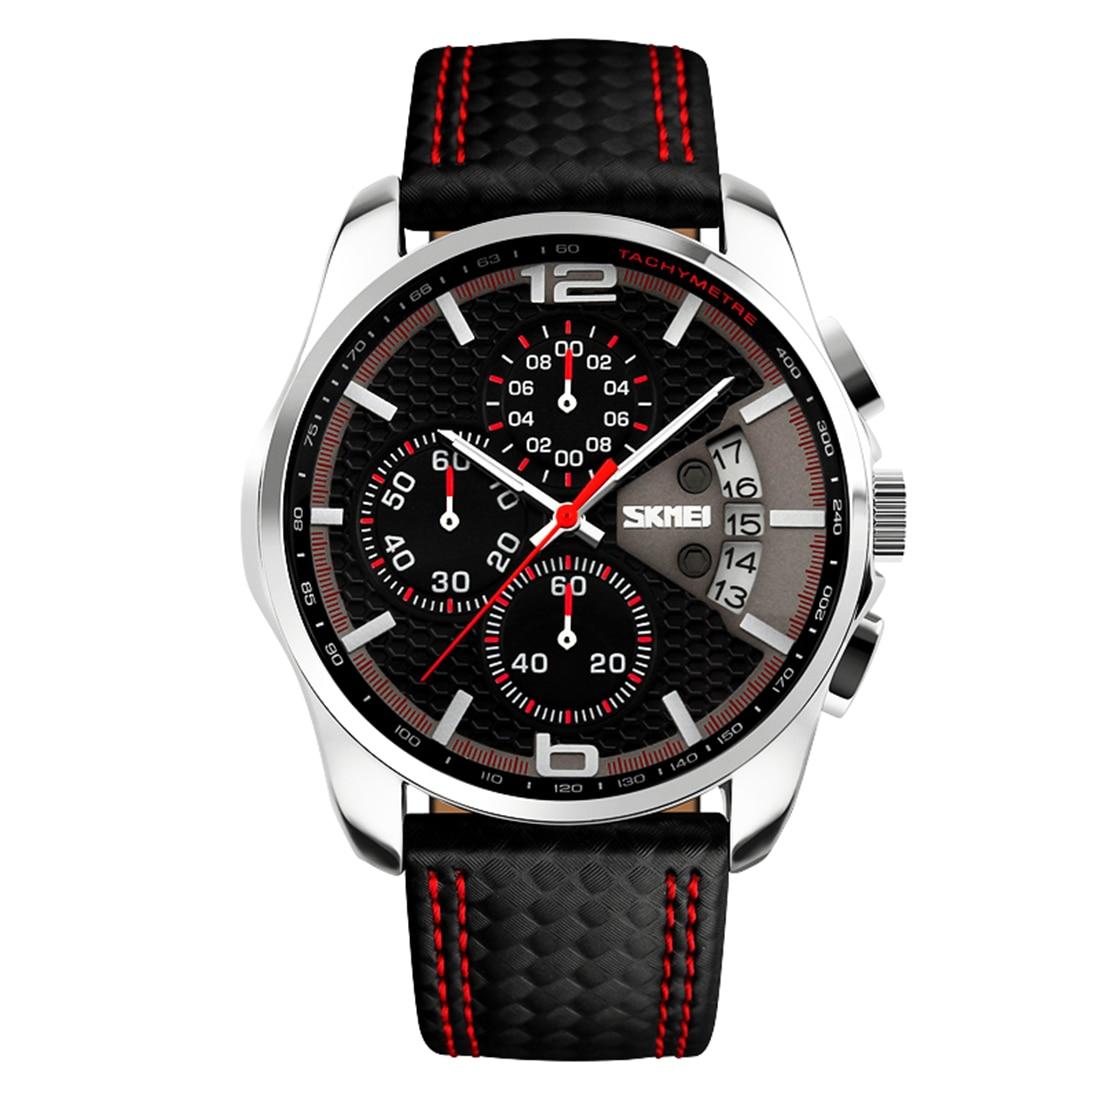 Hot sale men wristwatch dual time quartz watch tachymeter mens watches top brand luxury leather adjustable fashion sport watches